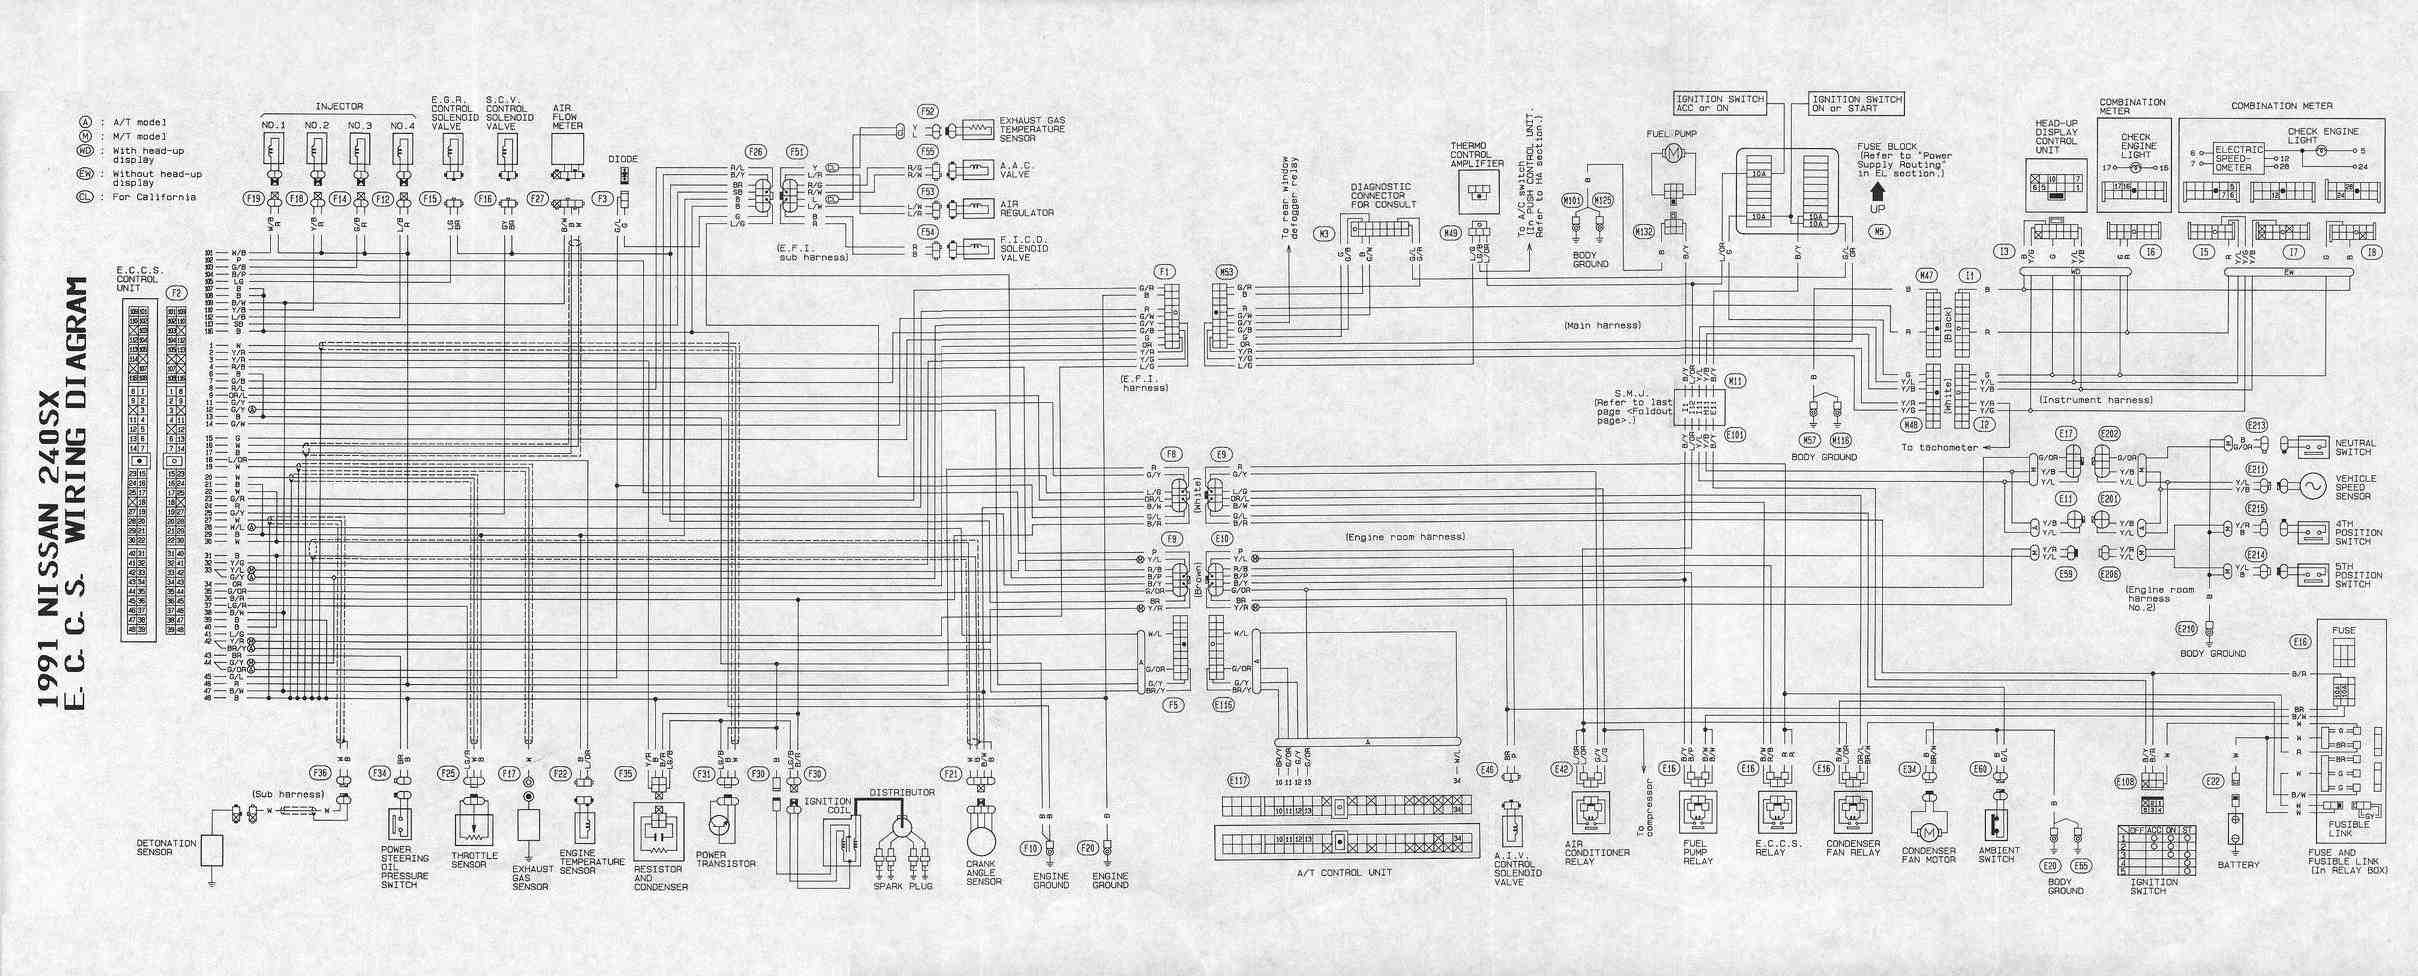 91 300zx Radio Wiring Diagram Detailed Schematics Nissan 1984 Stereo Free Download U2022 Oasis Dl Co Engine Harness